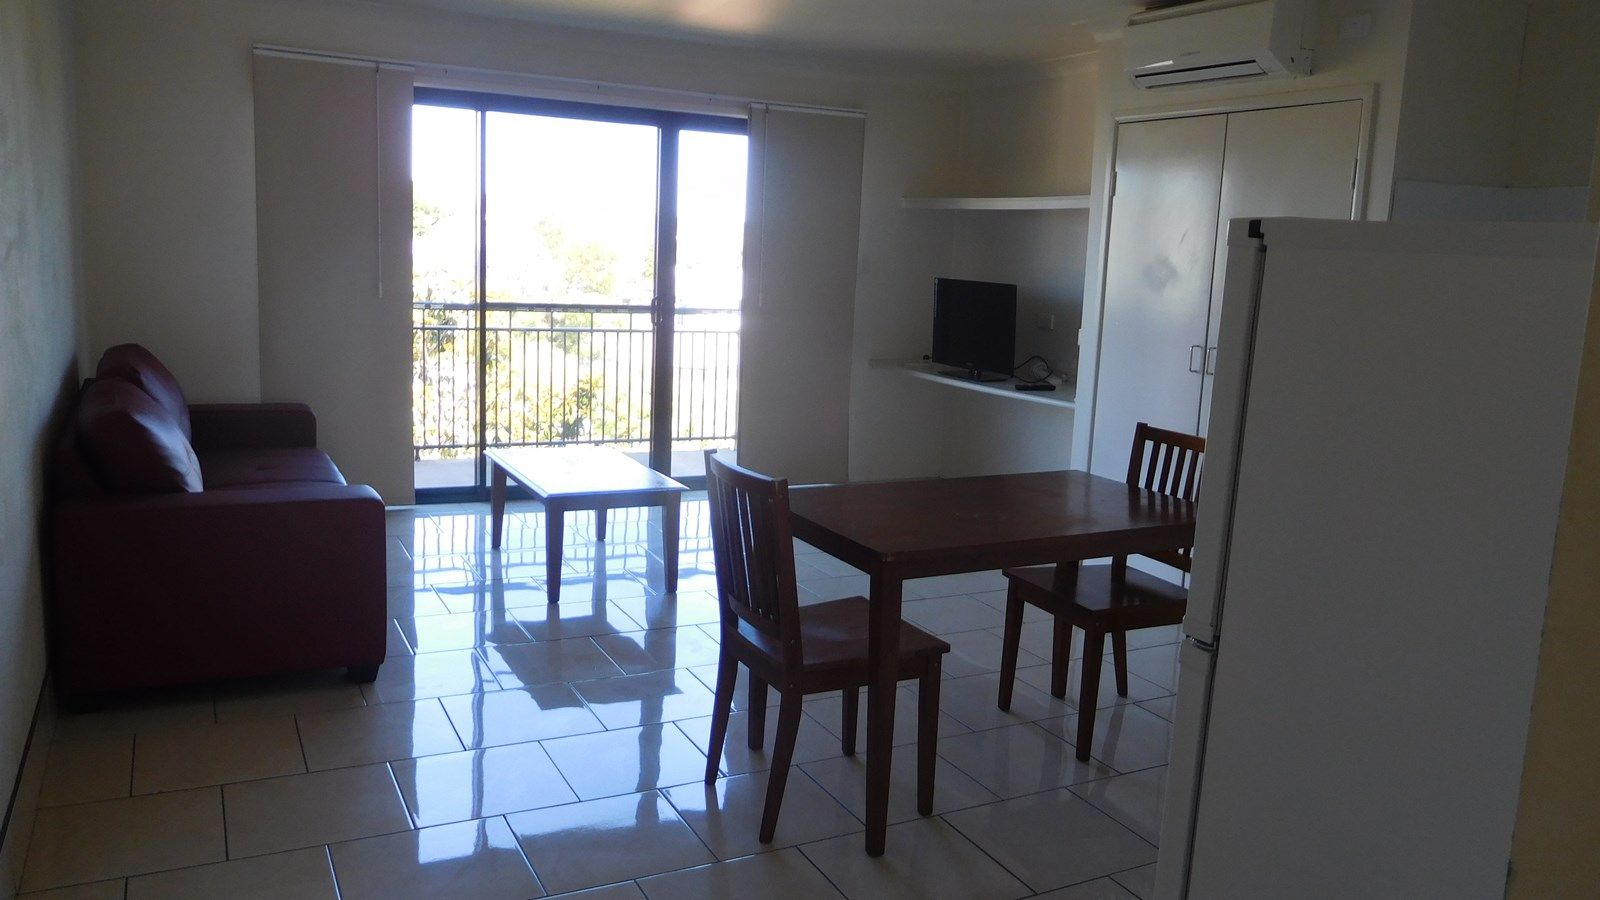 20/1-3 Uniplaza Court, Kearneys Spring QLD 4350, Image 1